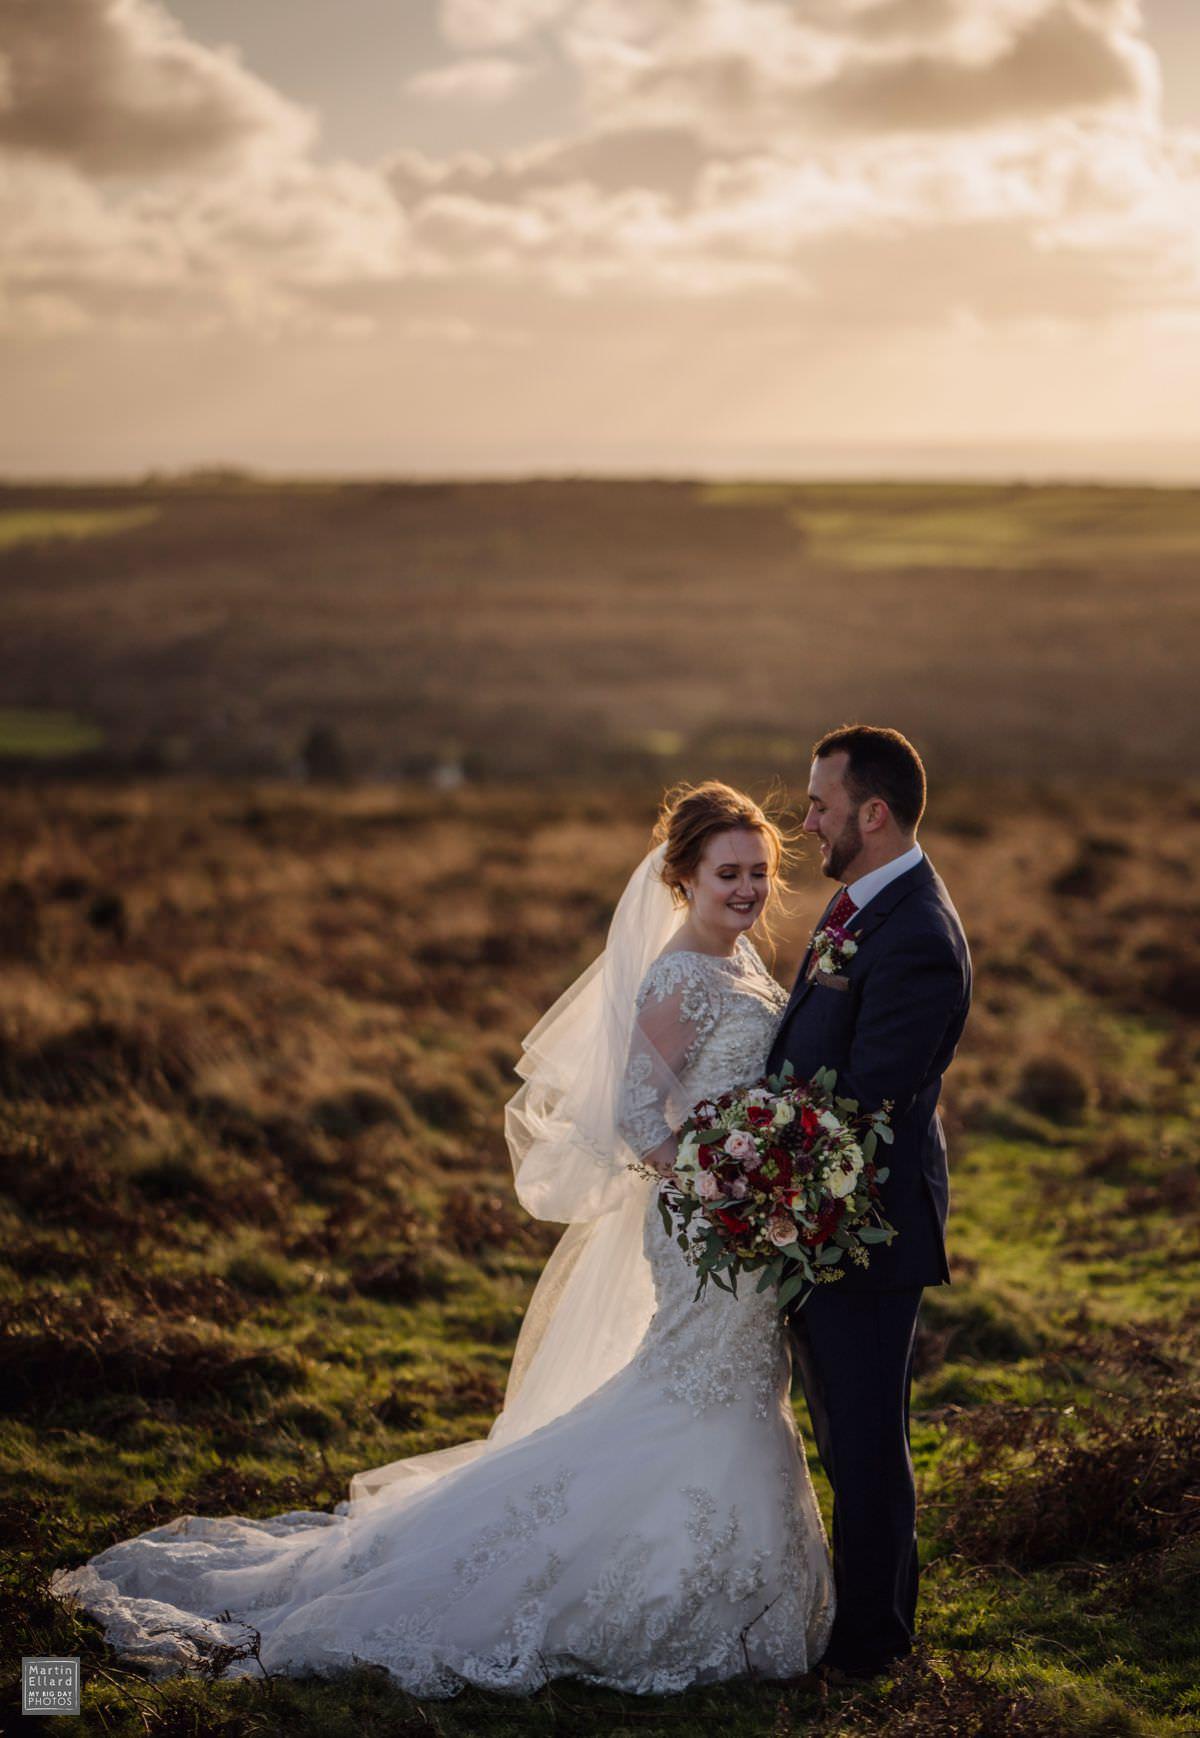 Gower wedding photographer